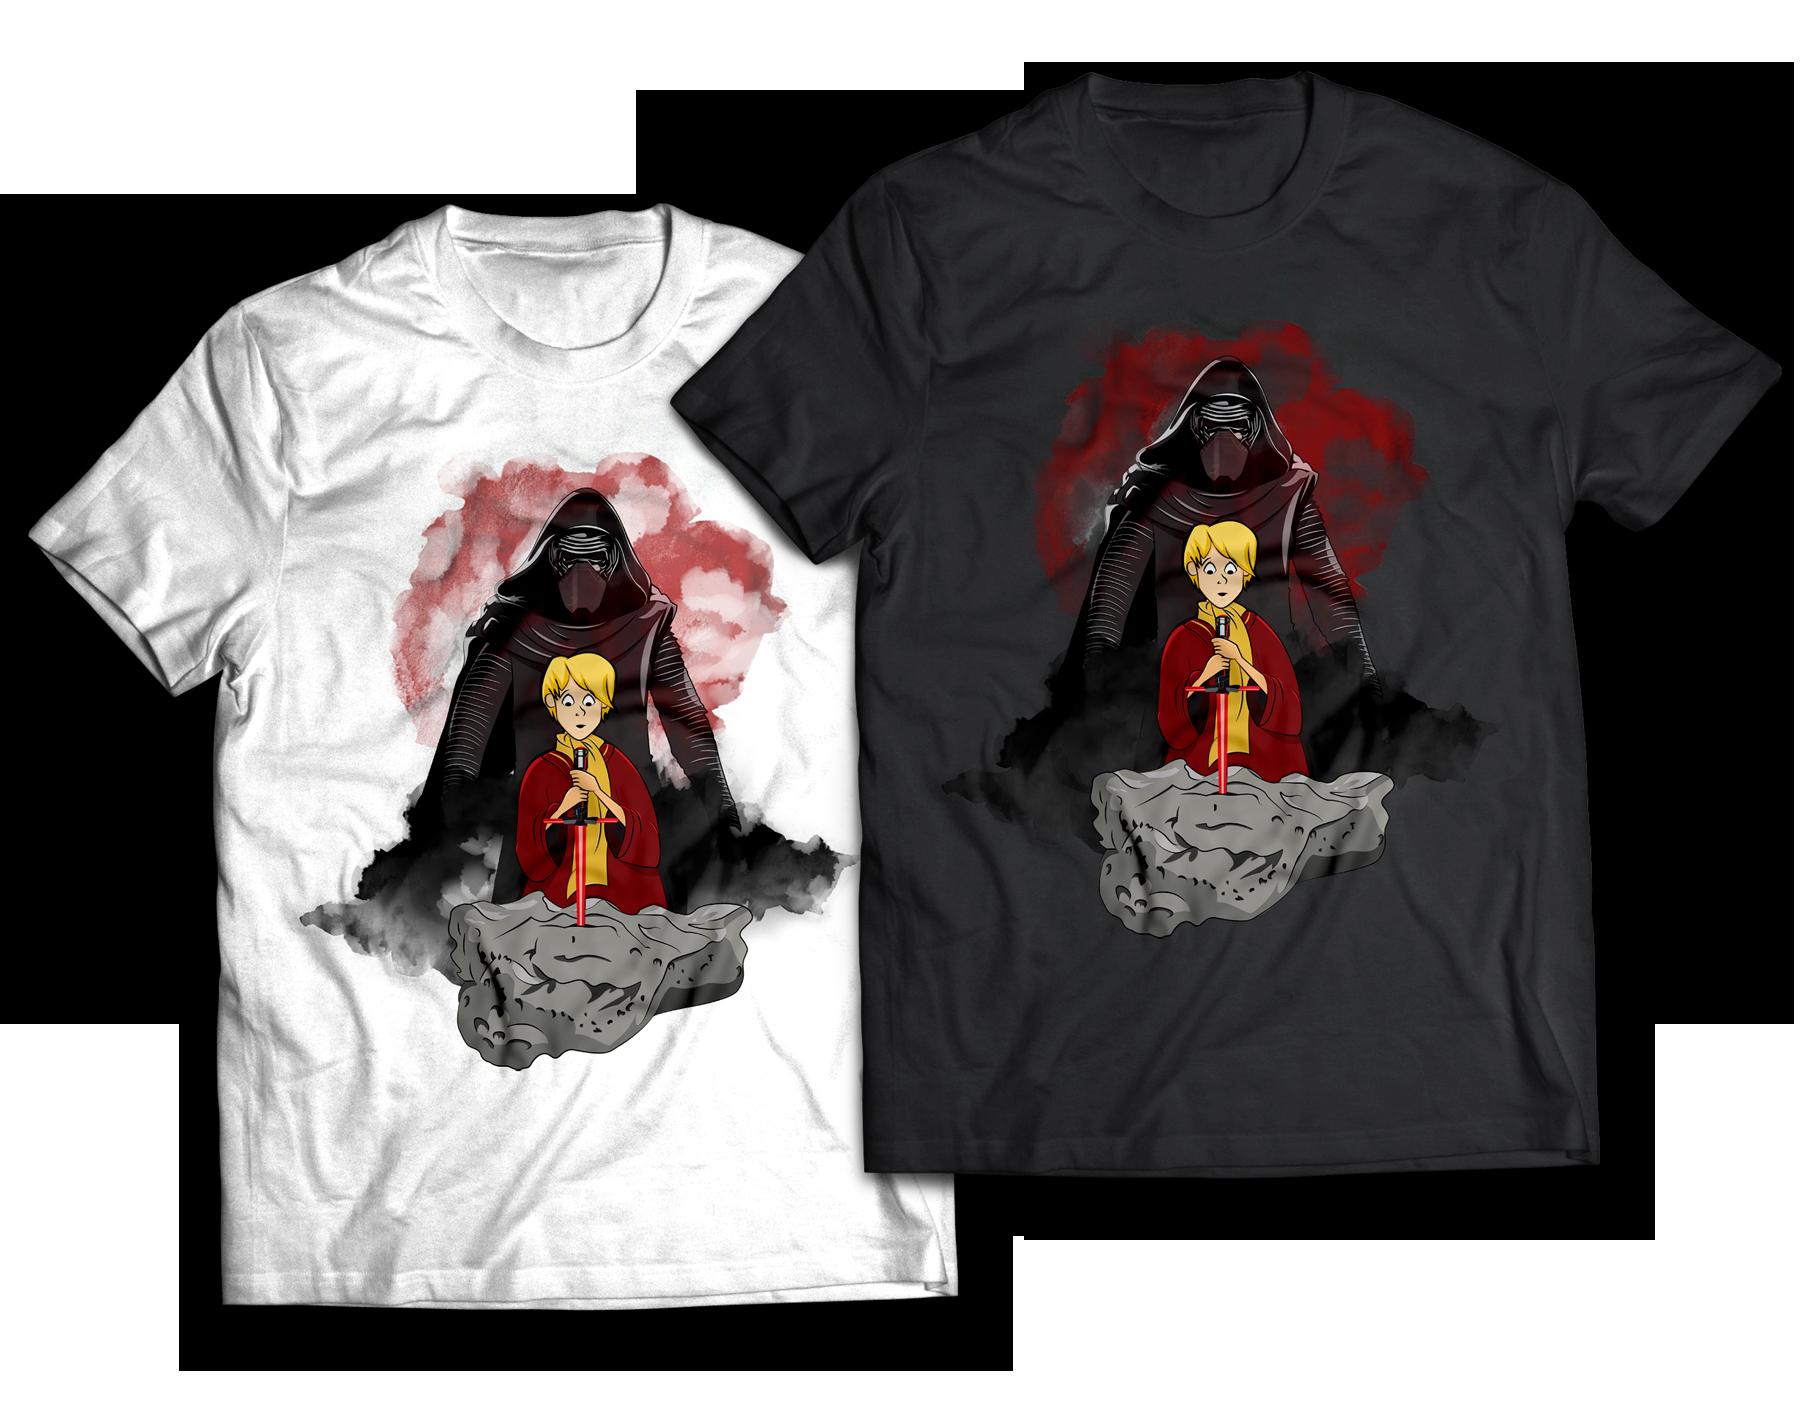 Kylo Ren Sword in the Stone Mashup T-shirt design Jlane Design Teepublic